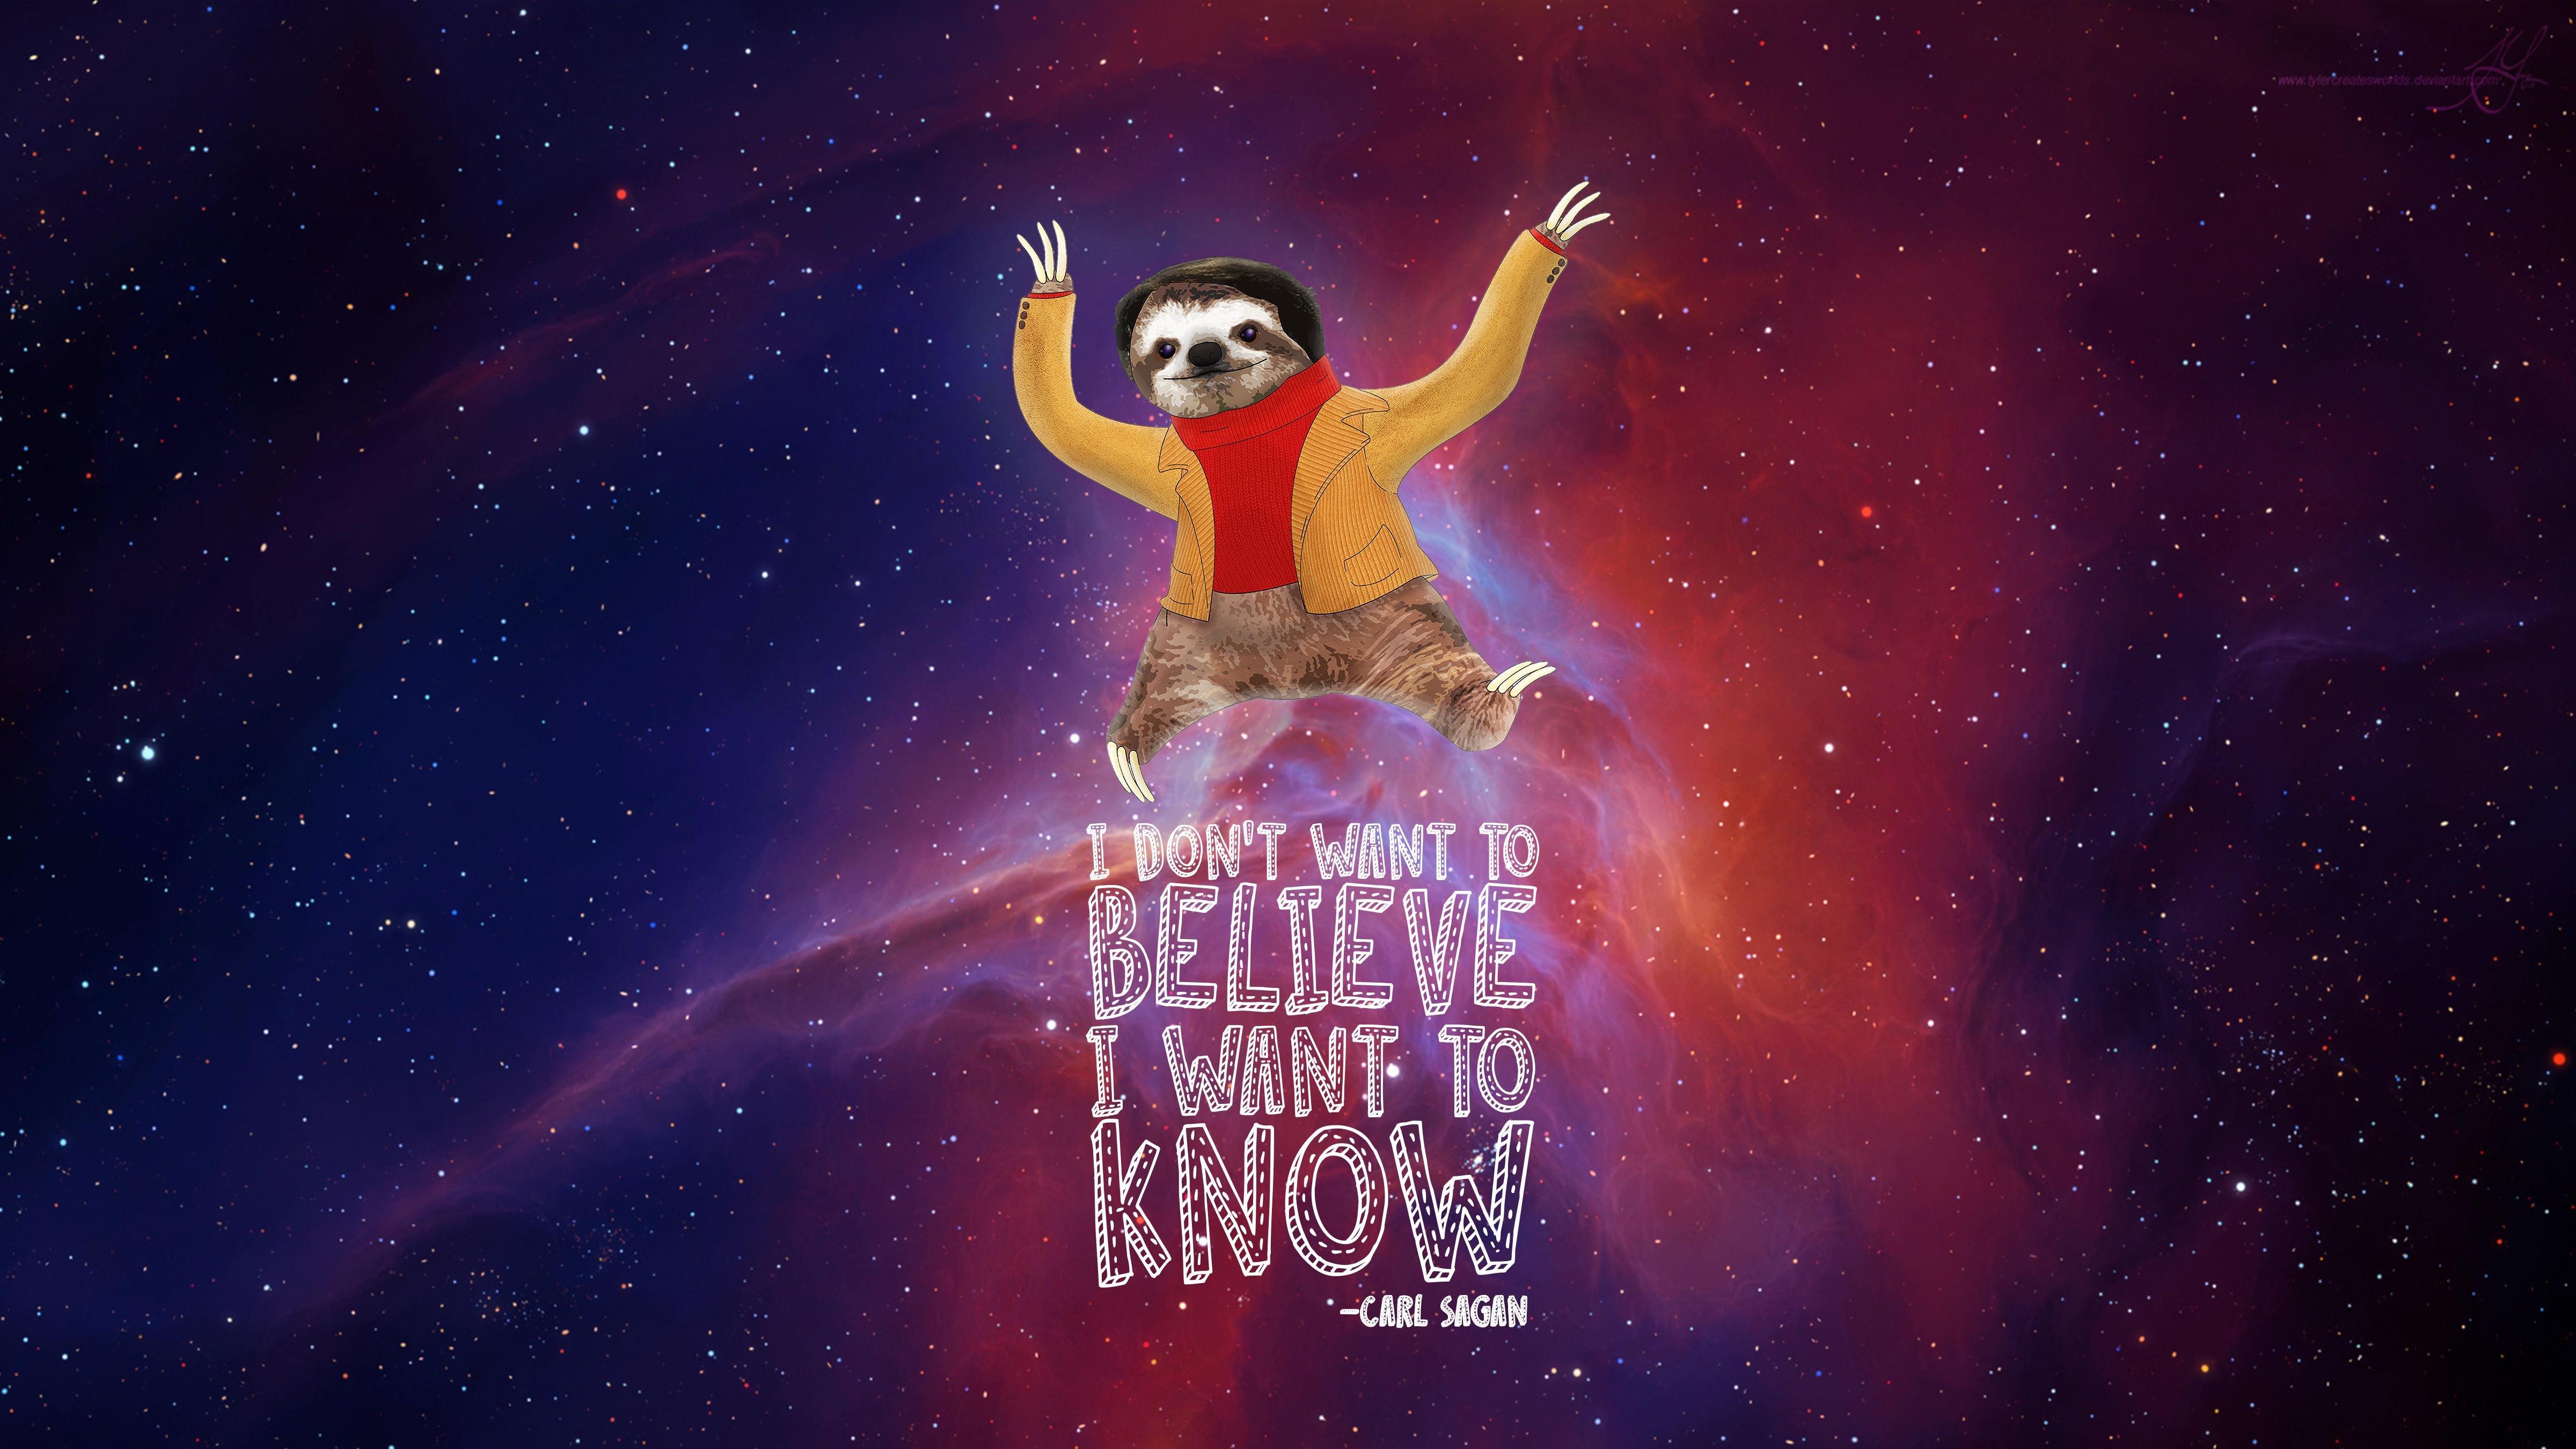 Carl Sagan Sloth Wallpaper